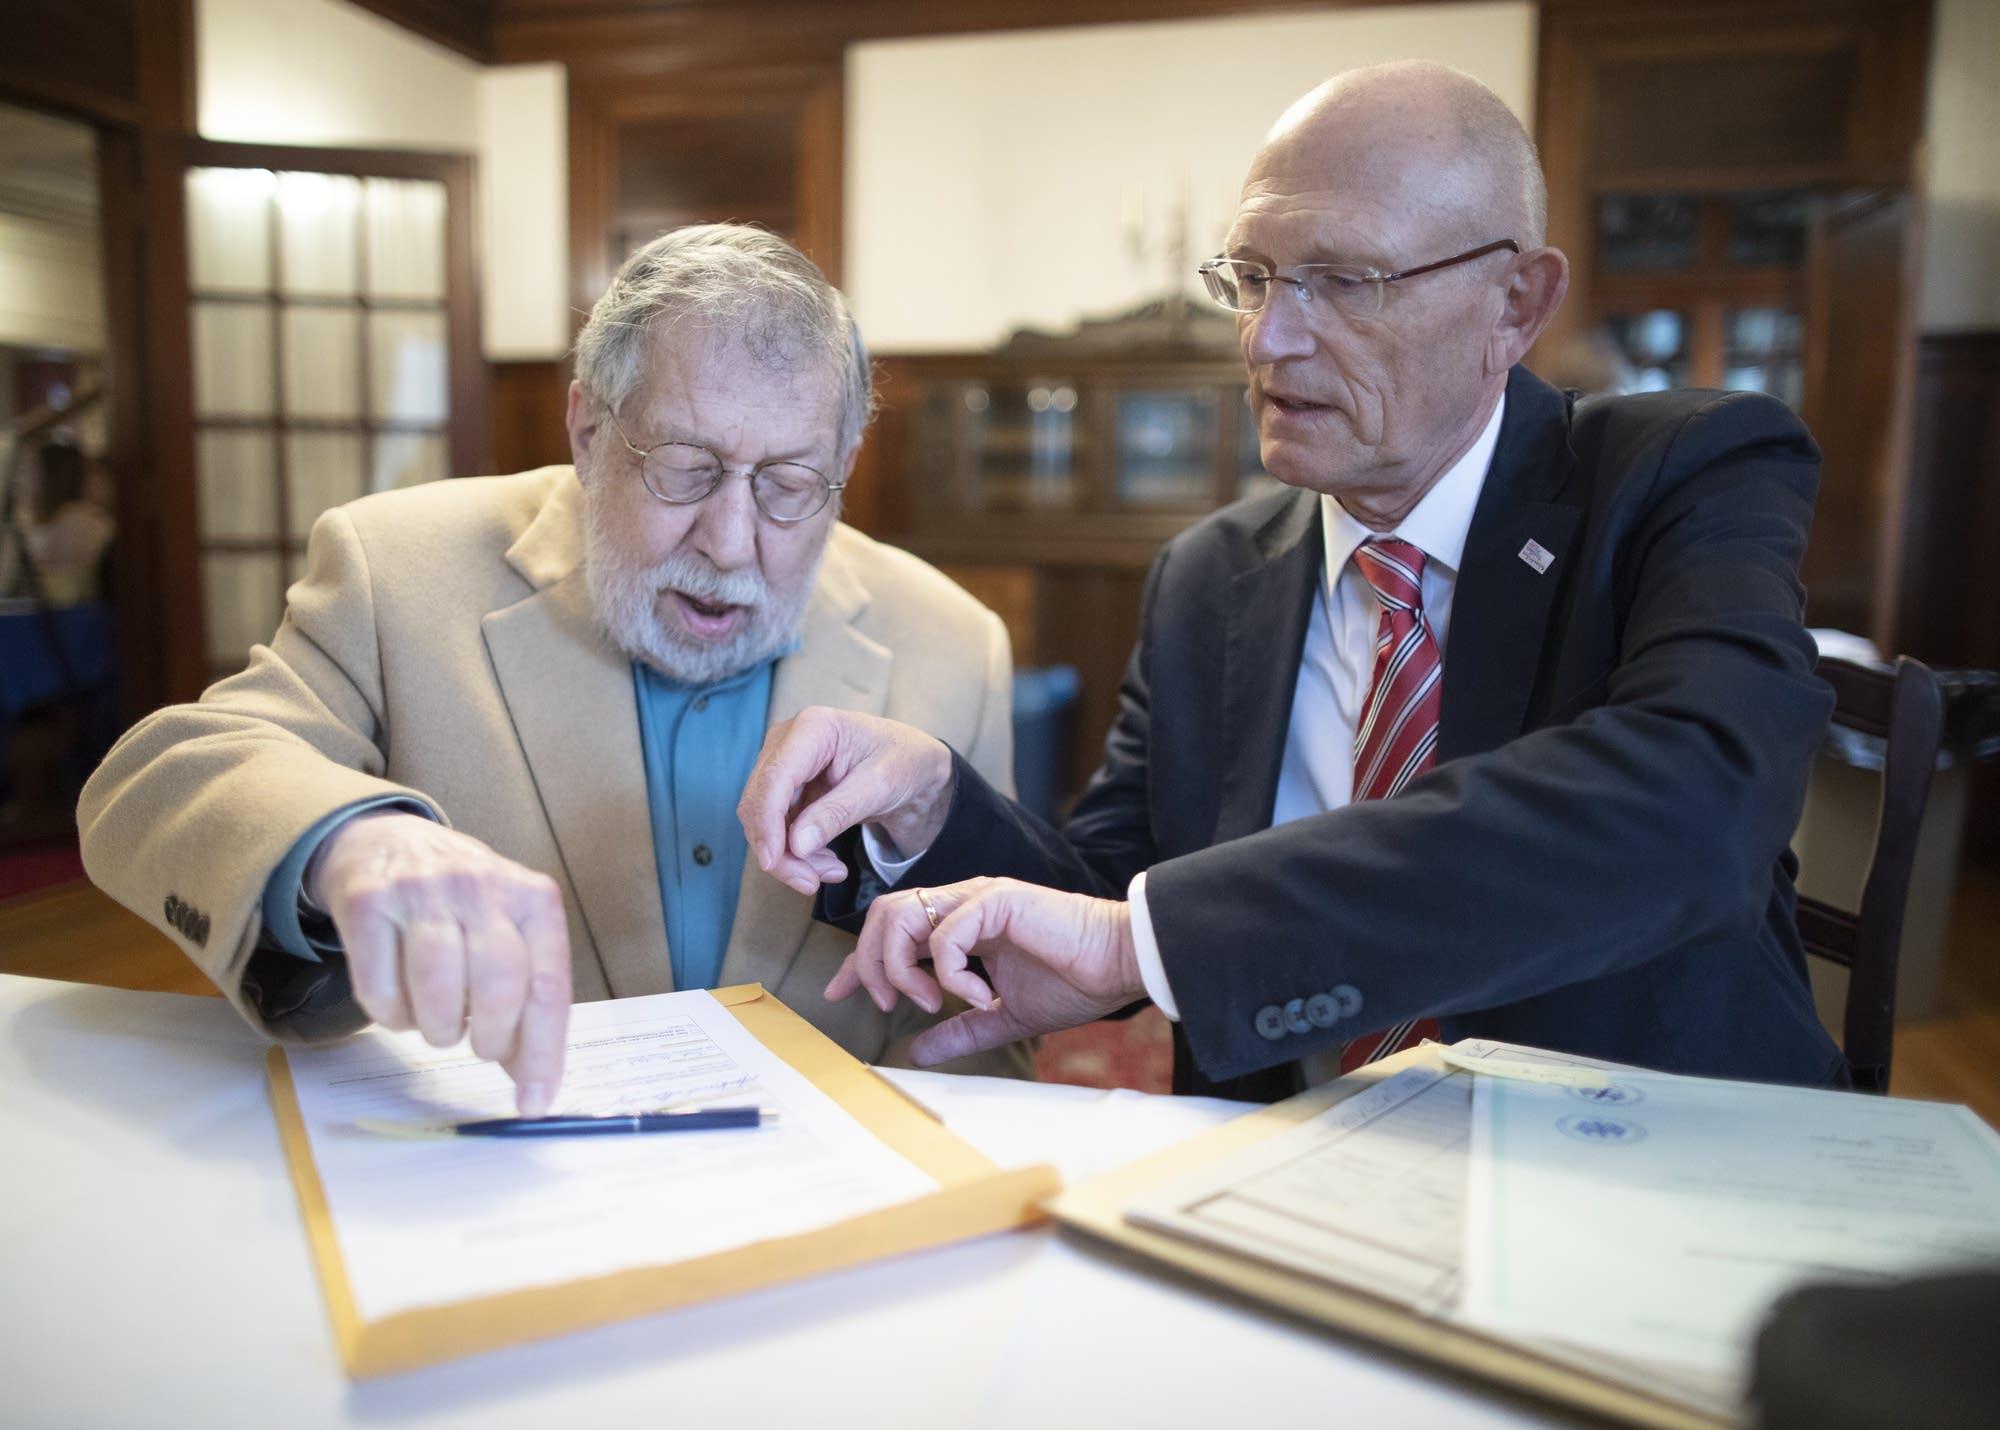 Fred Amram (left) signs citizenship documents.